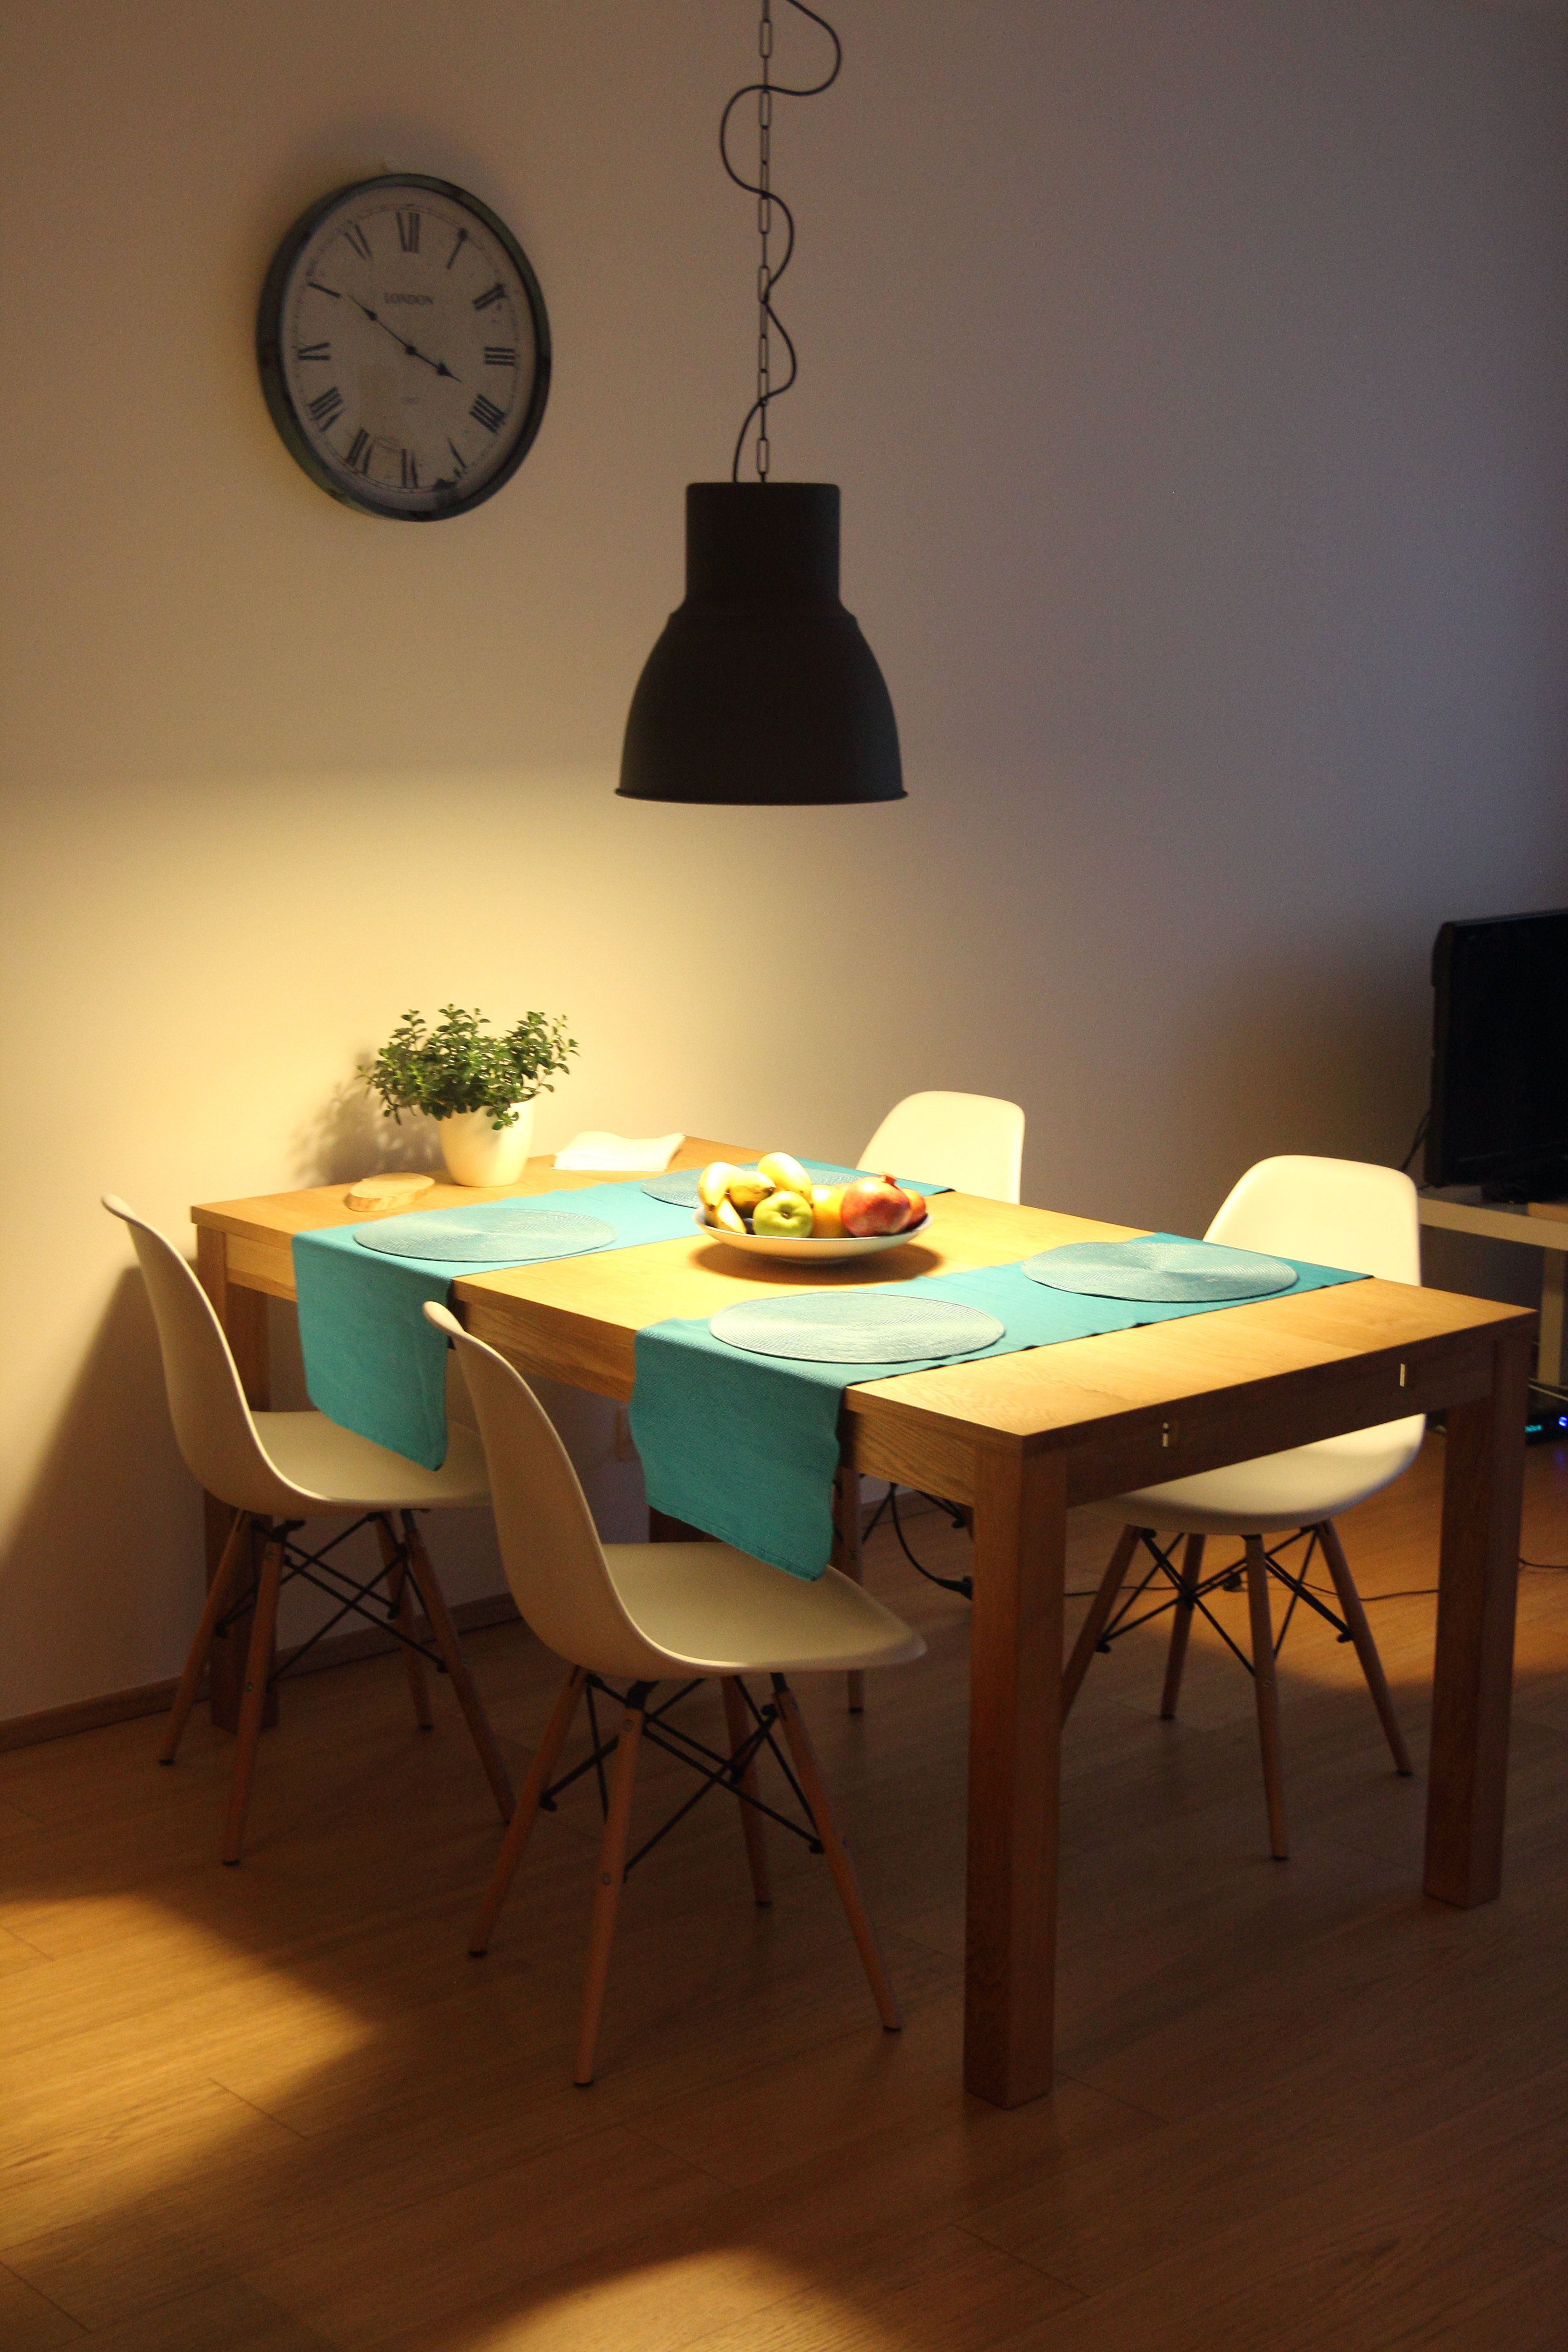 Oak Jysk Table White Chairs Ikea Big Hektar Lamp Wall Clock